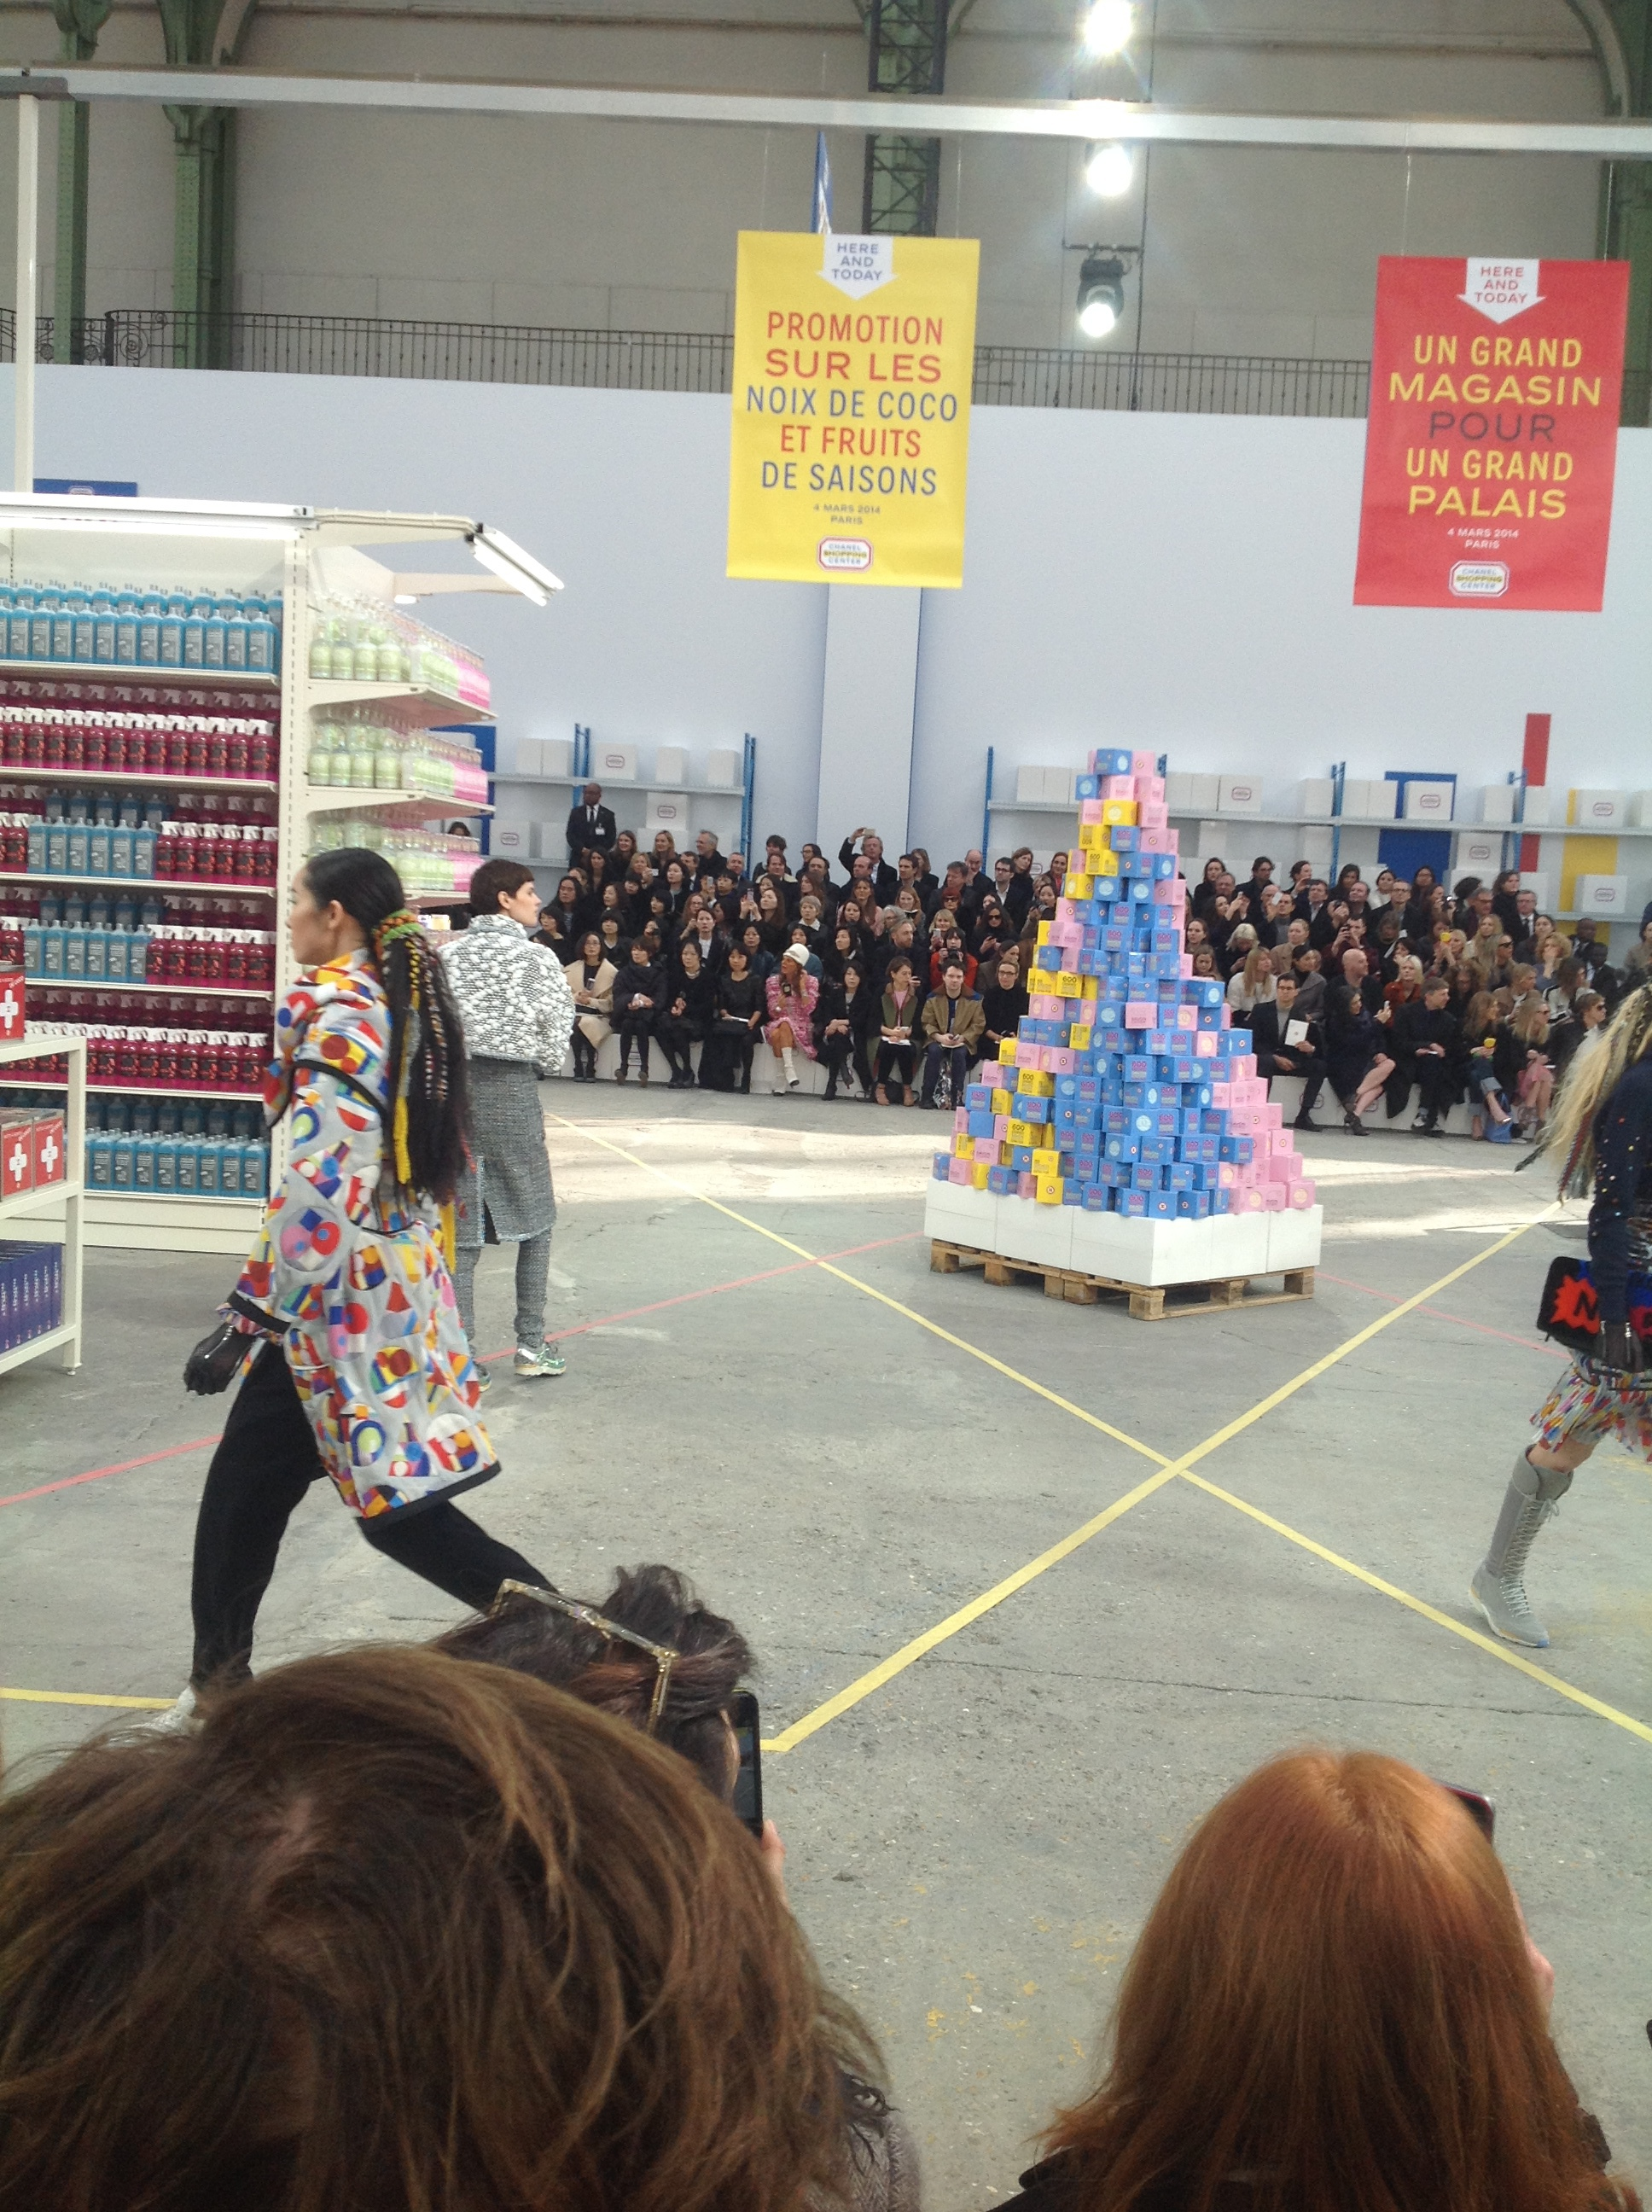 foto-sfilata-chanel-parigi2014.JPG